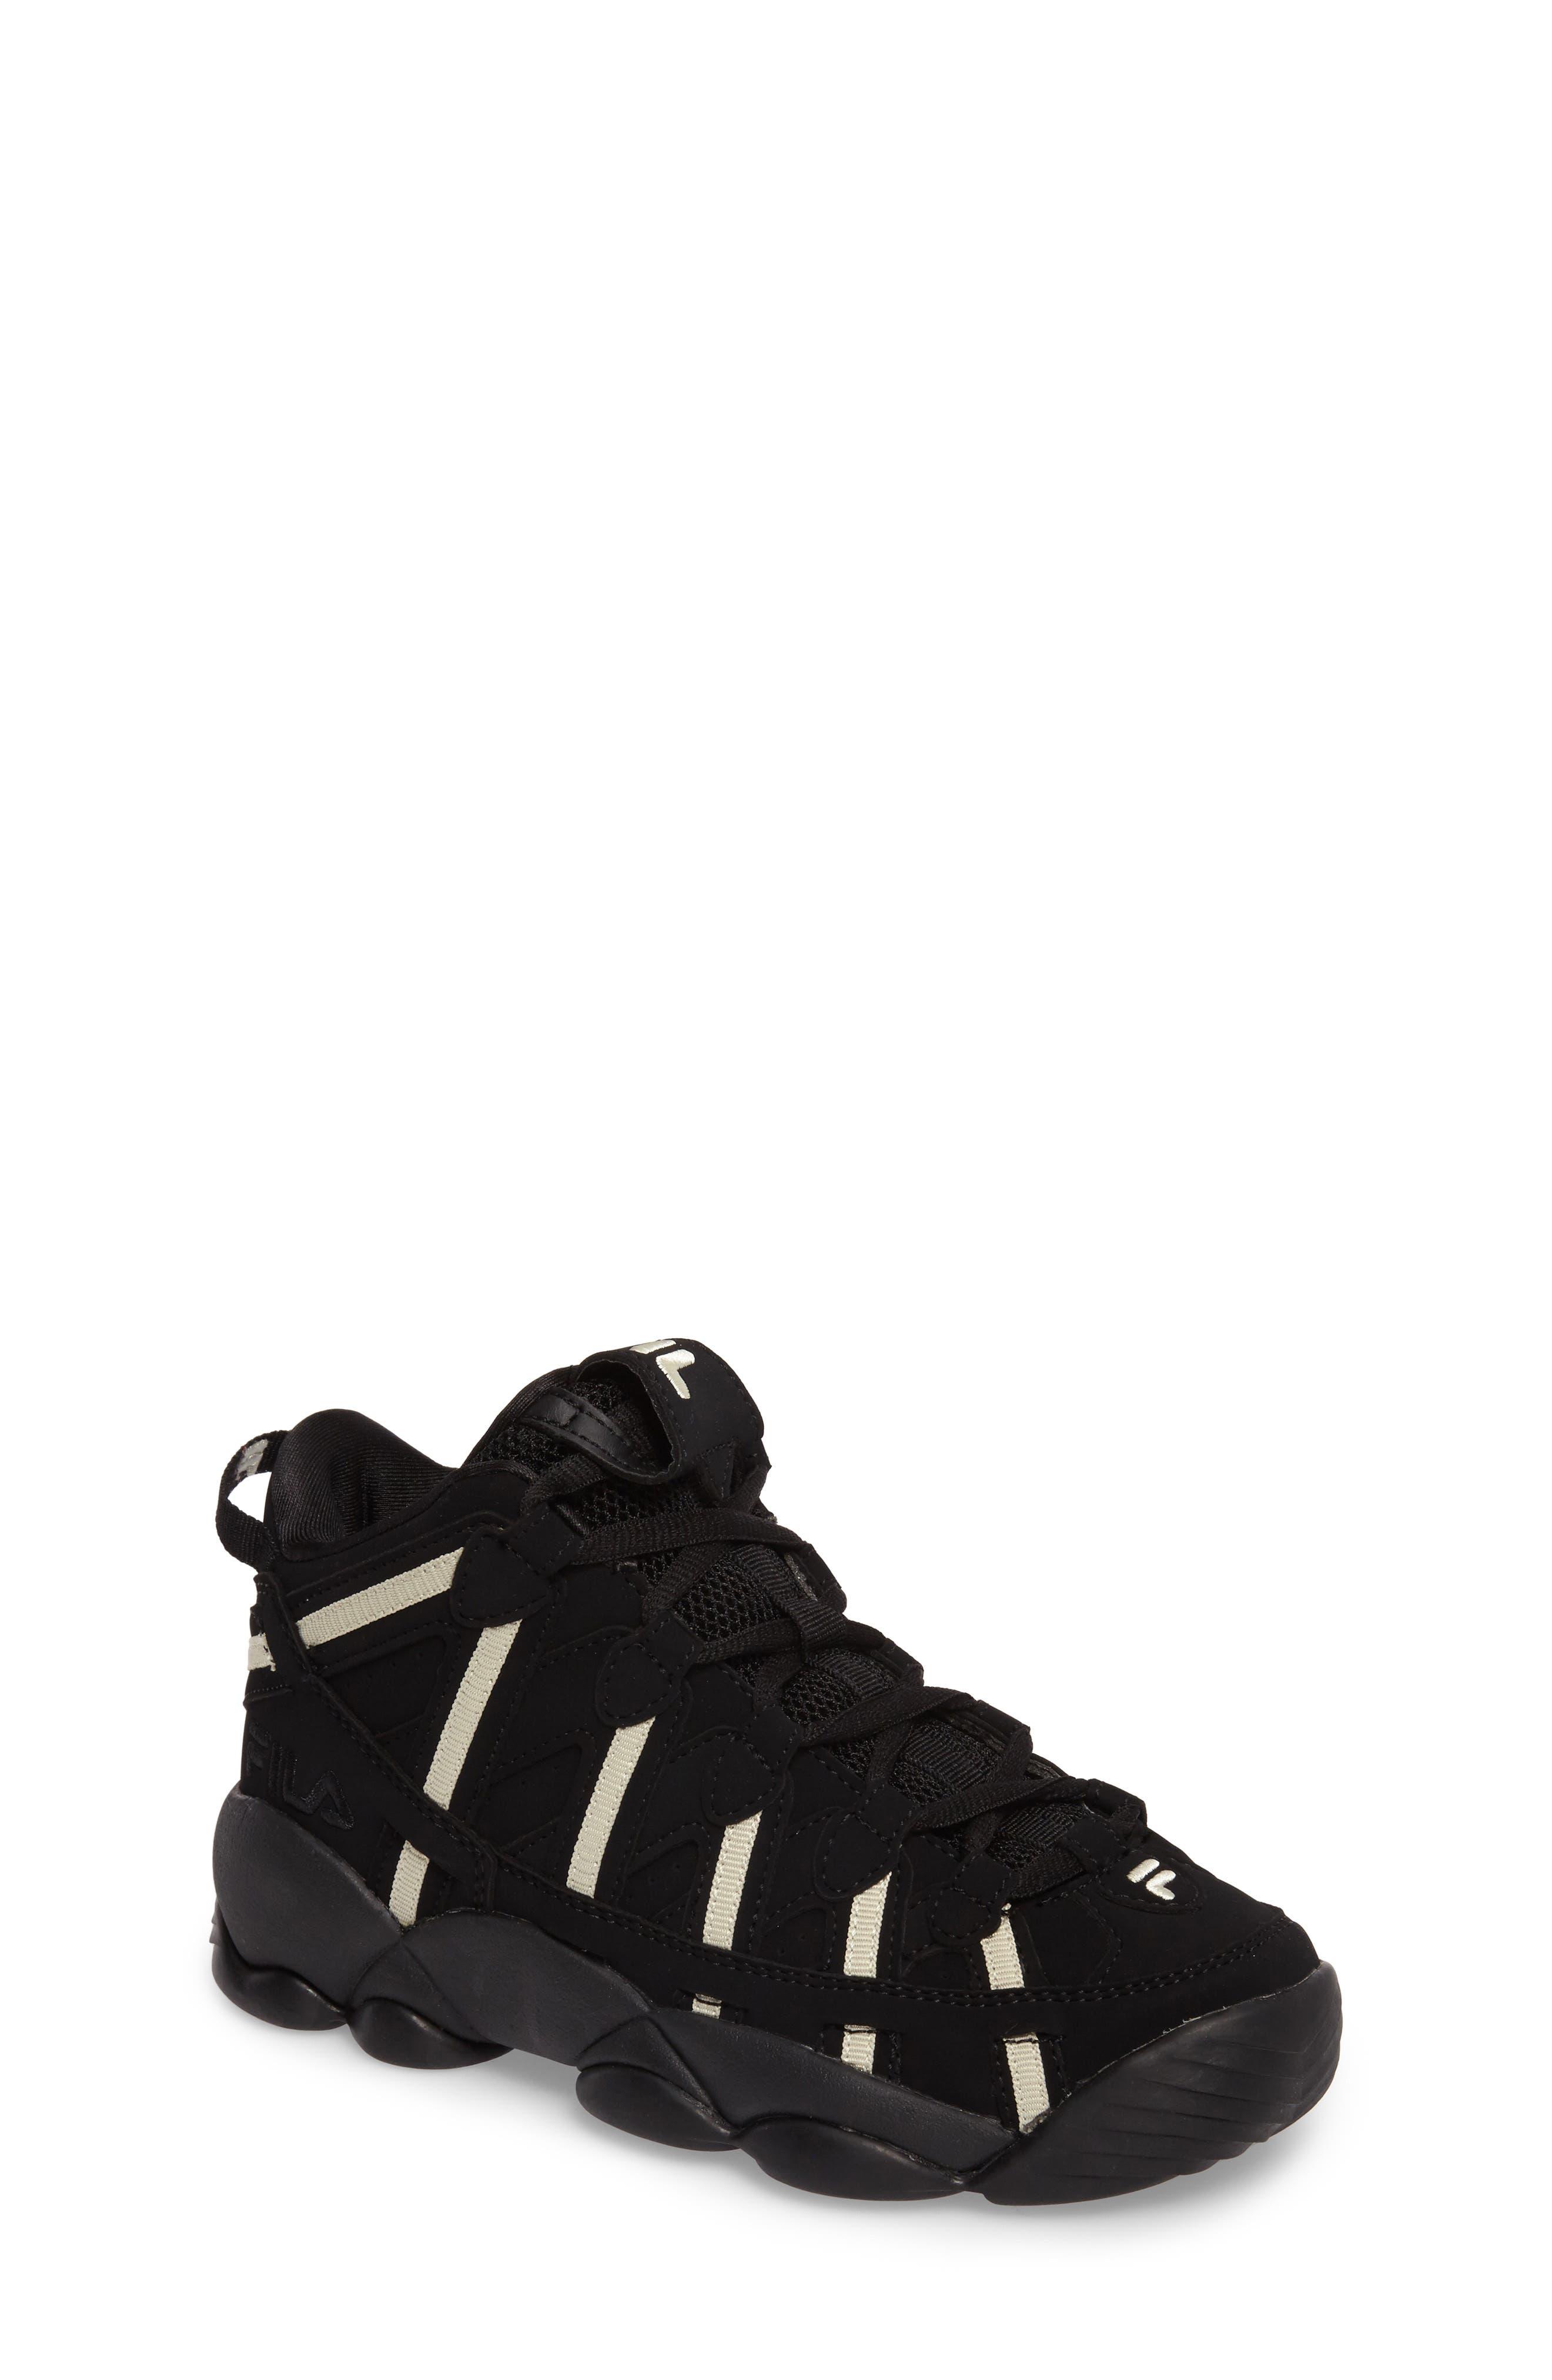 Spaghetti Deluxe Mid Top Sneaker,                             Main thumbnail 1, color,                             Black/ Cream